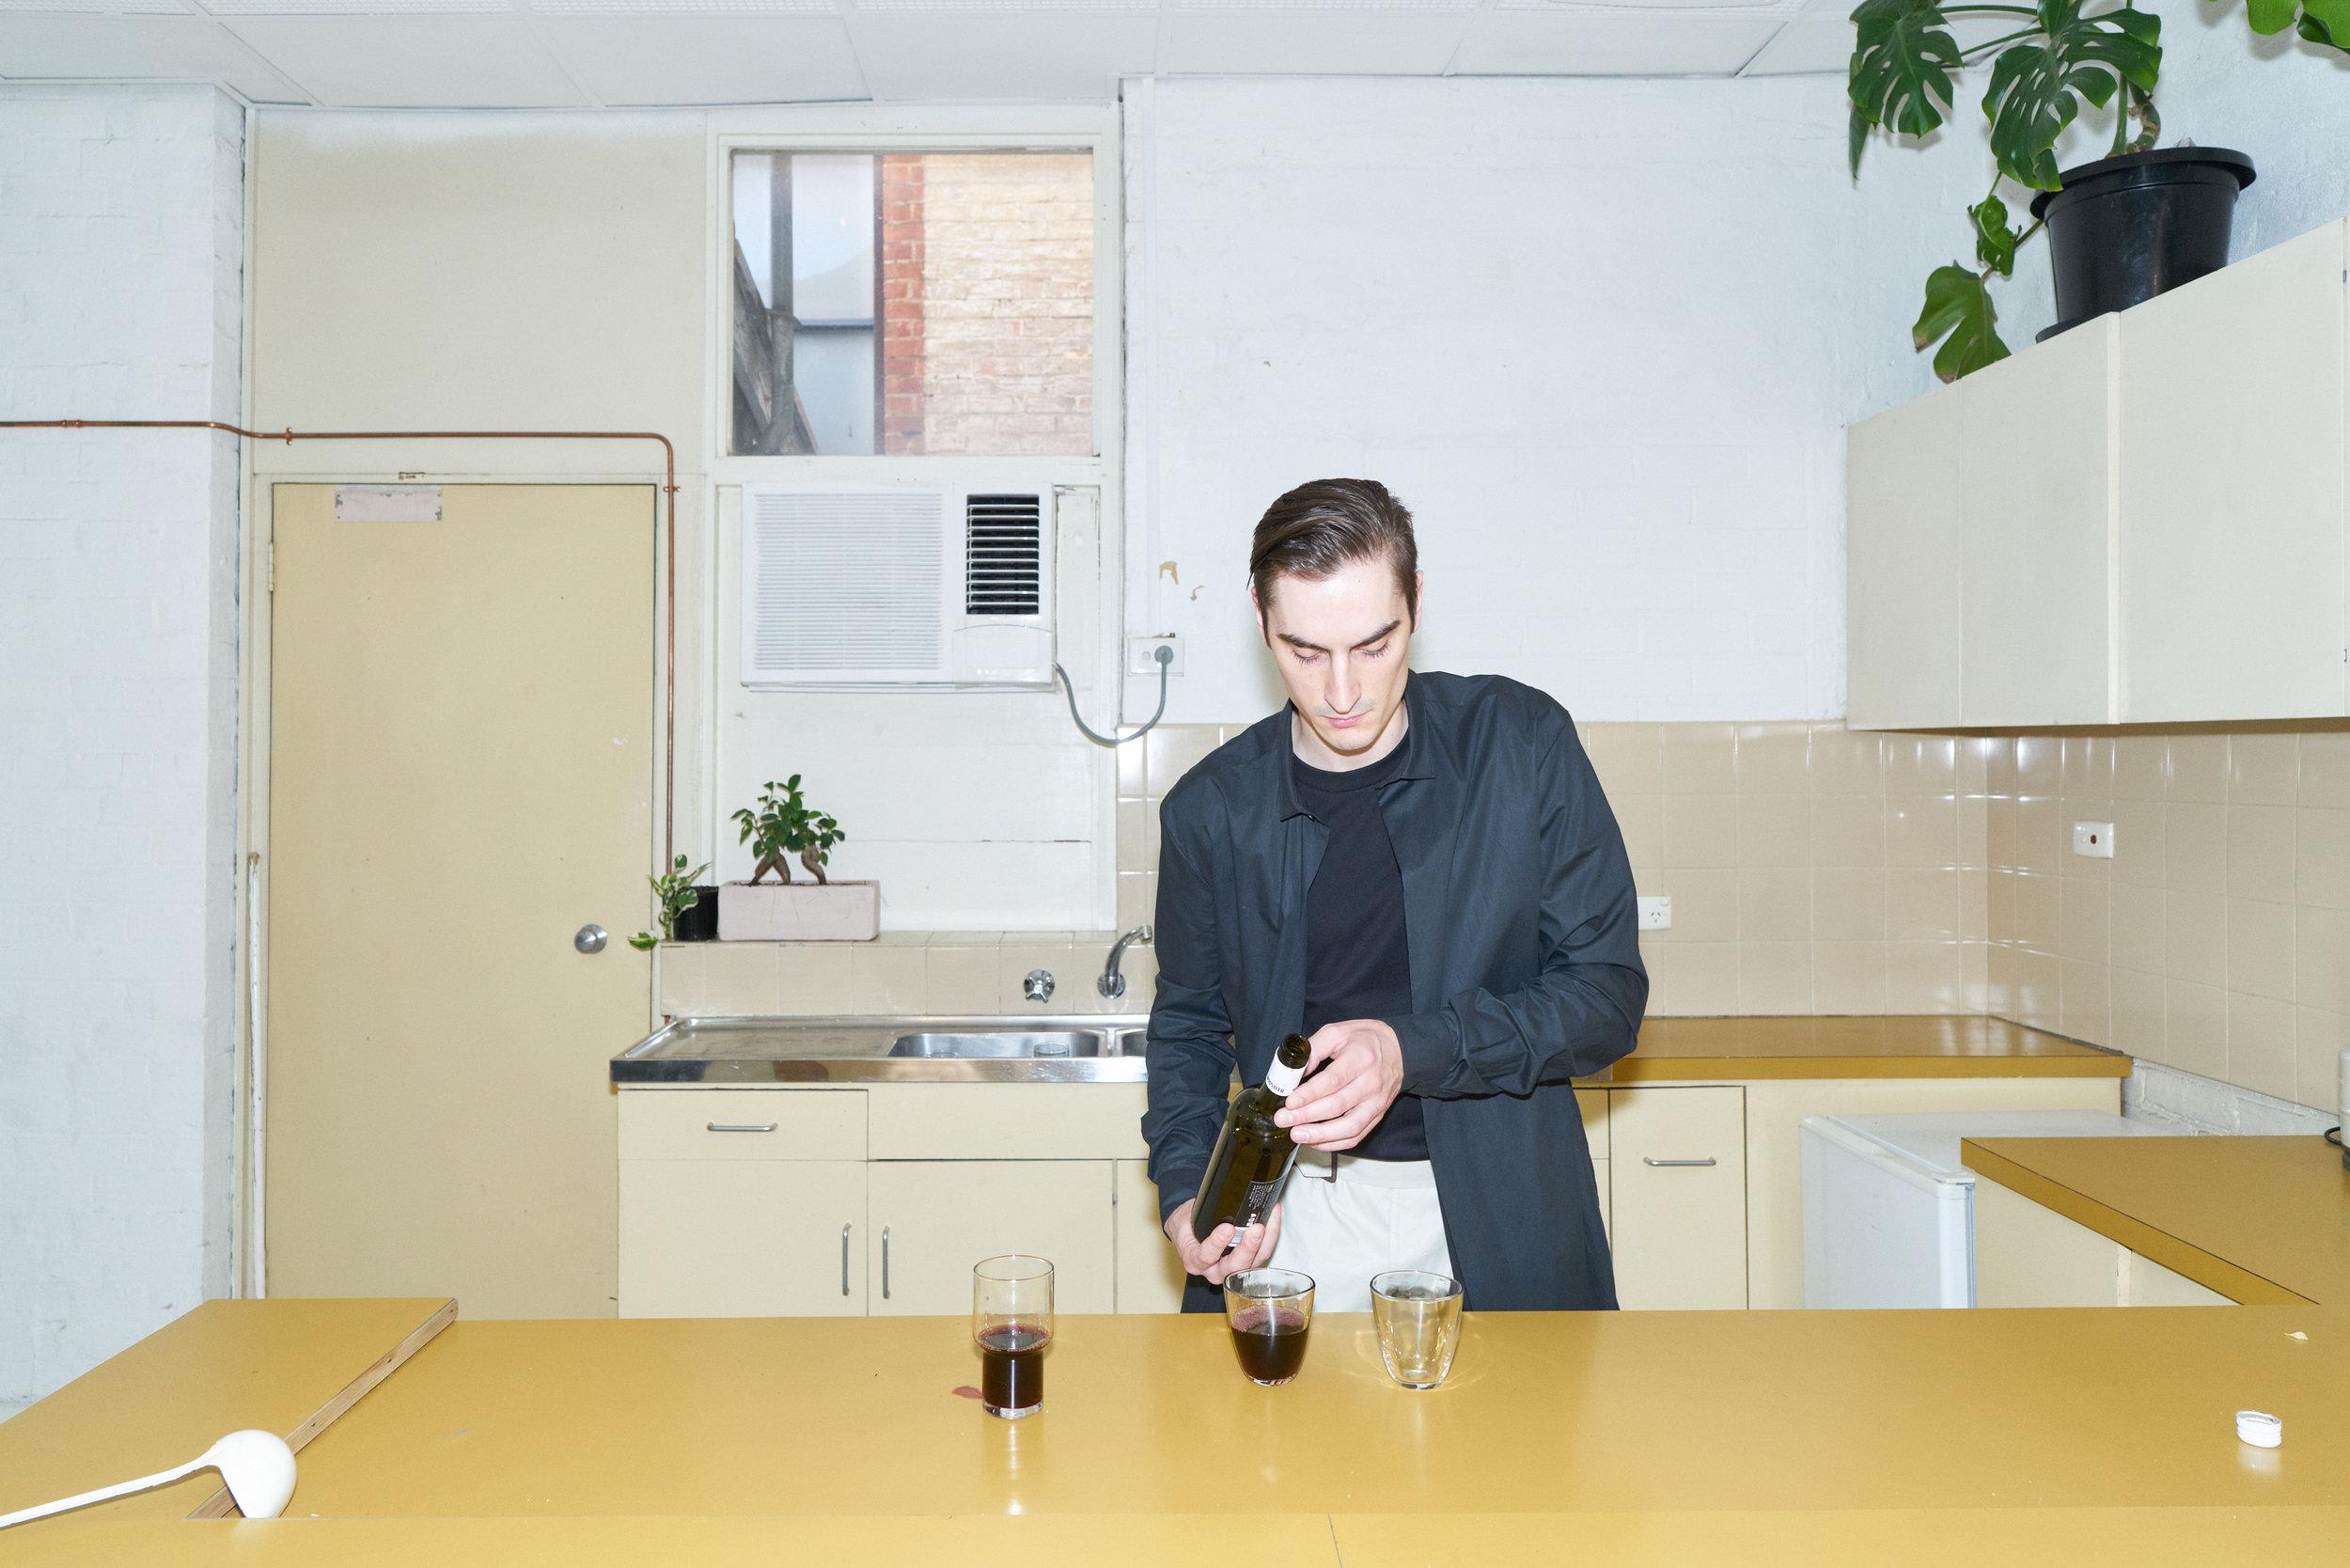 20181127_Website launch shoot [Joe at studio]_DSC04595.jpg